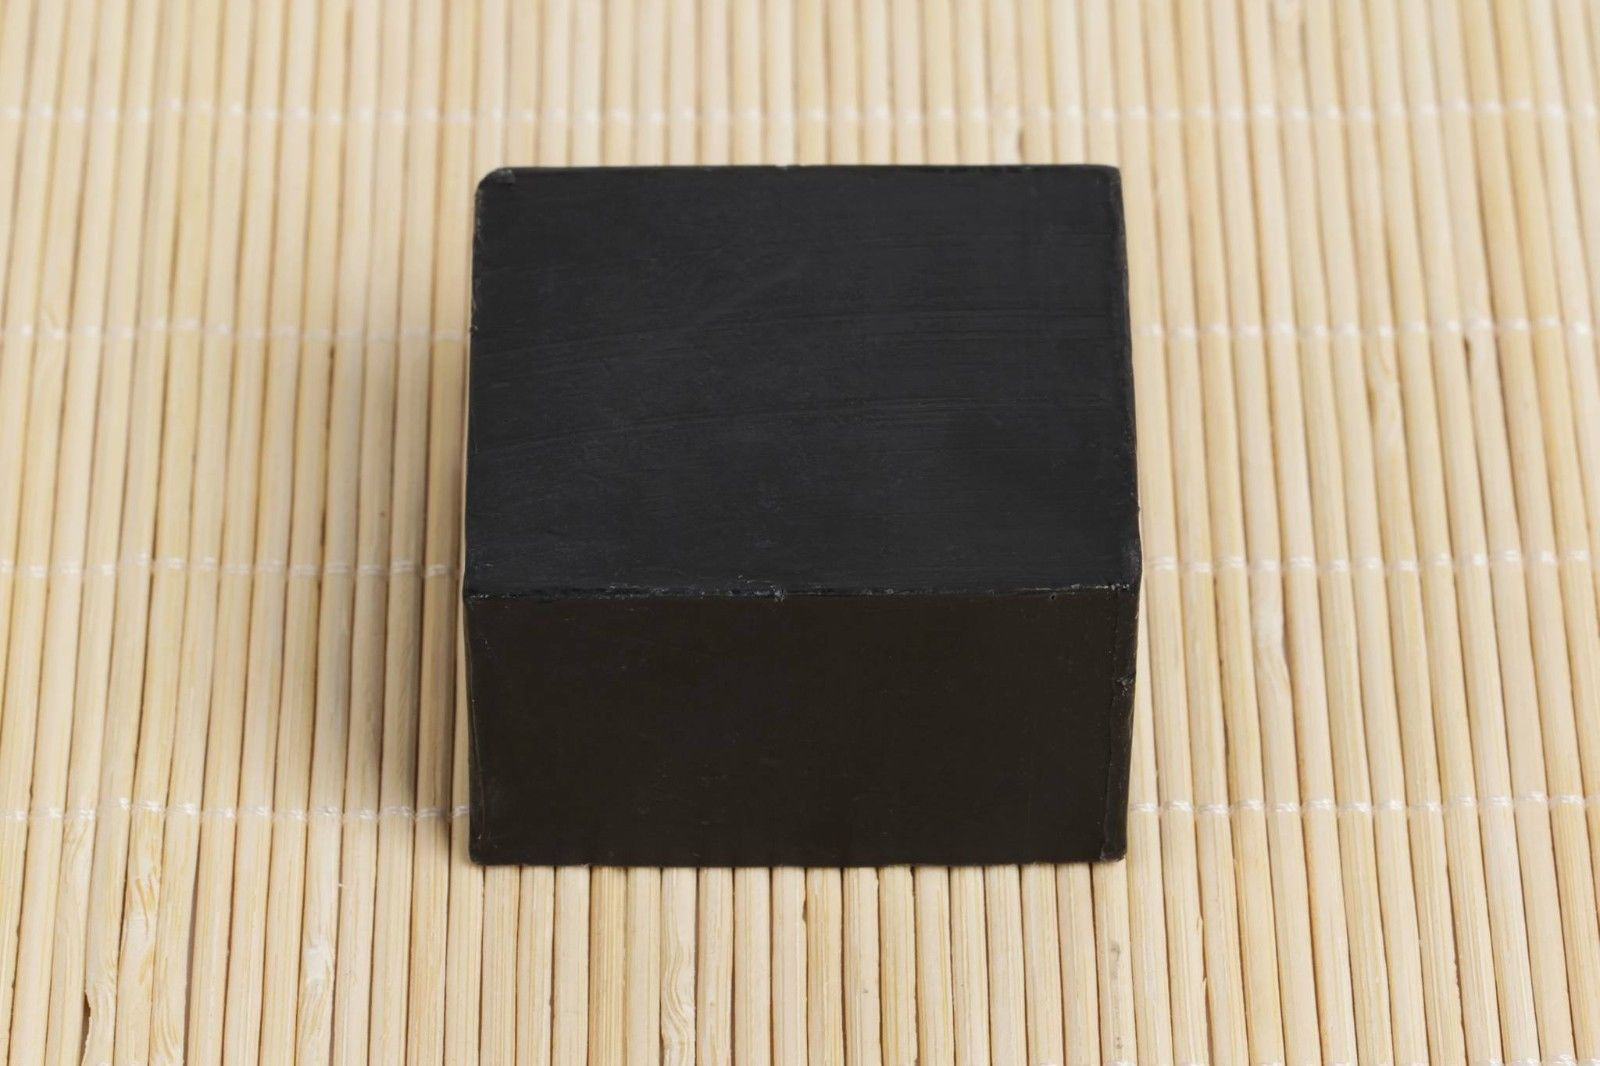 Activated Bamboo Charcoal Black Soap 4 - 3.35 OZ Handmade Bars Light Fresh New